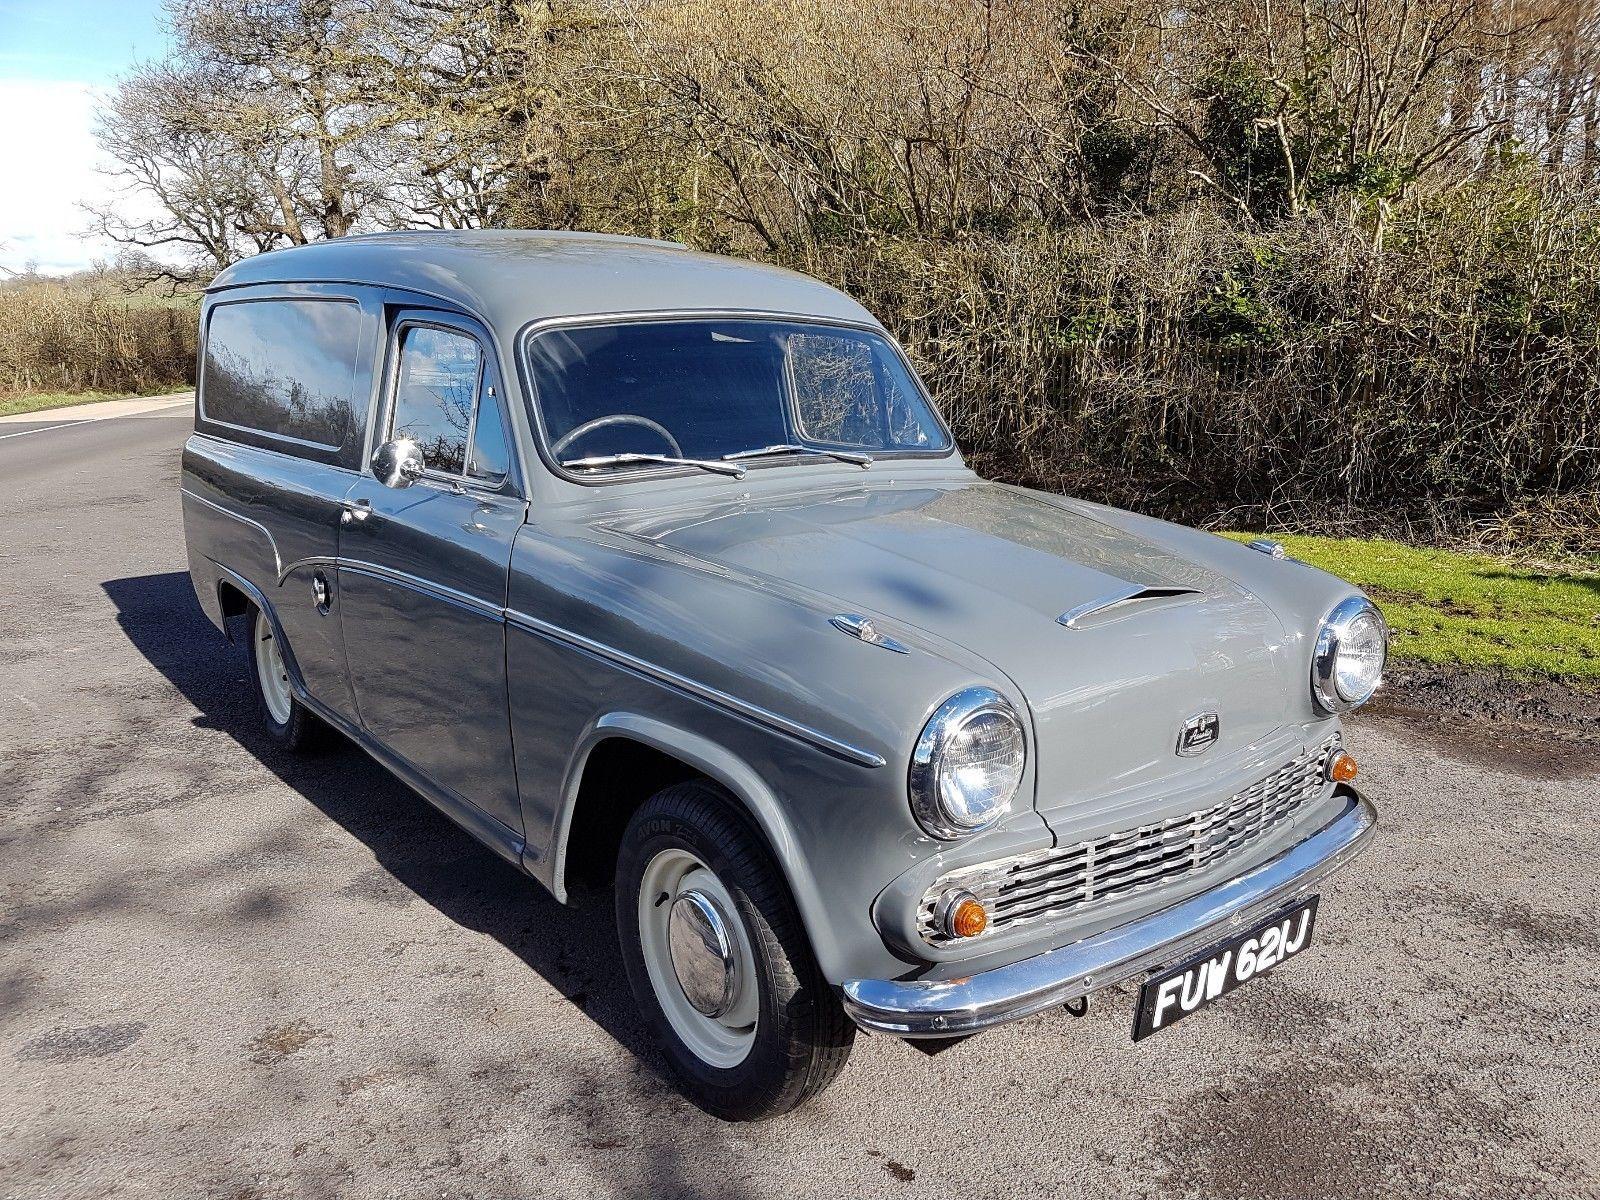 eBay: 1971 Austin A60 10 cwt van, long MOT, drives well, delightful ...